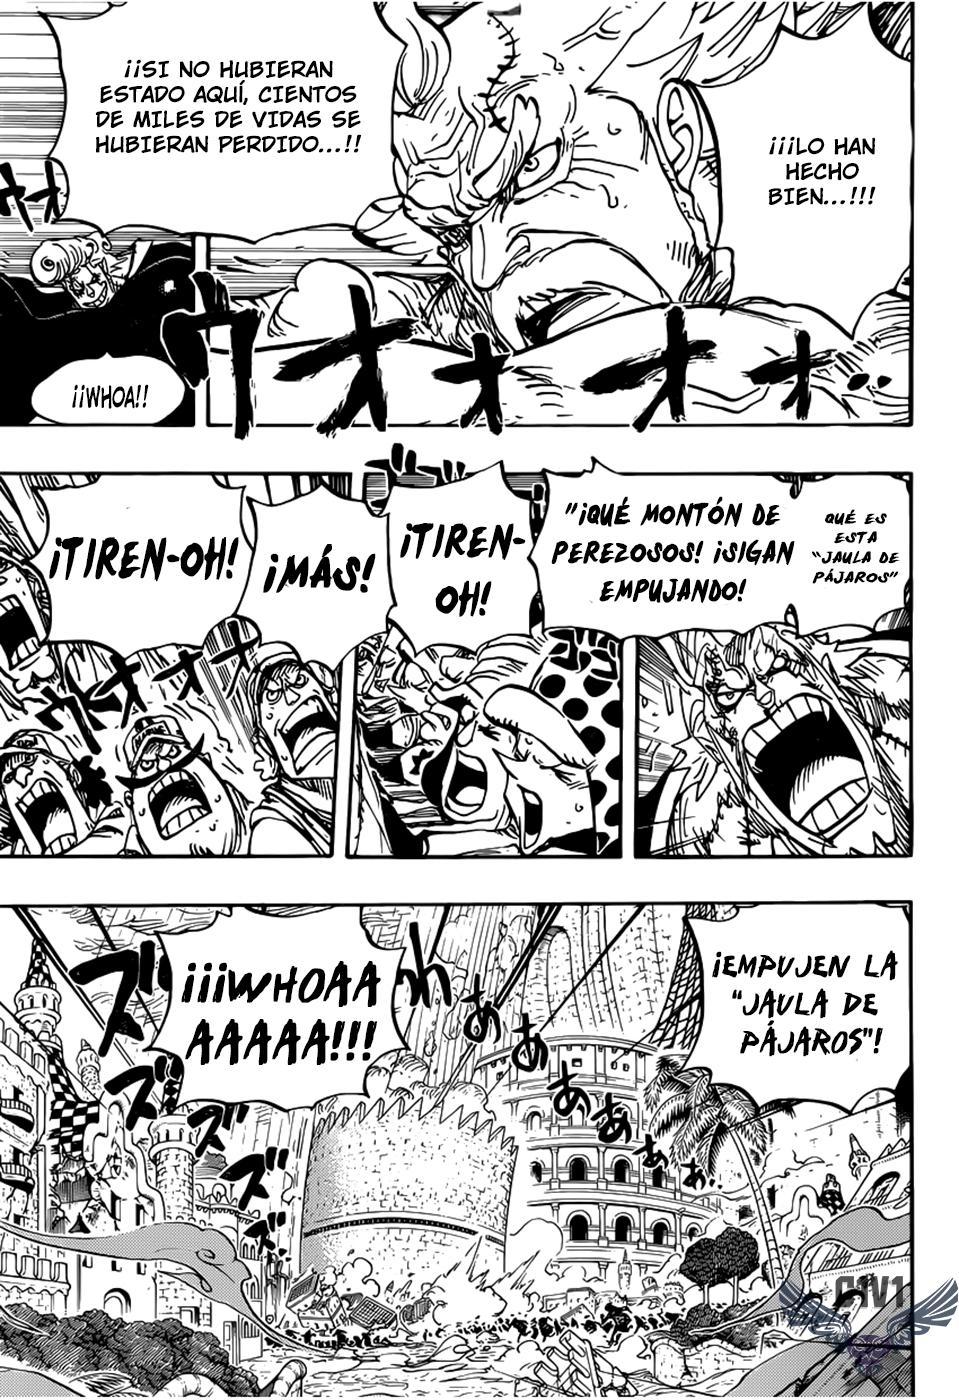 http://c5.ninemanga.com/es_manga/50/114/379752/e65da2392672bfaa382312263caceb9d.jpg Page 4